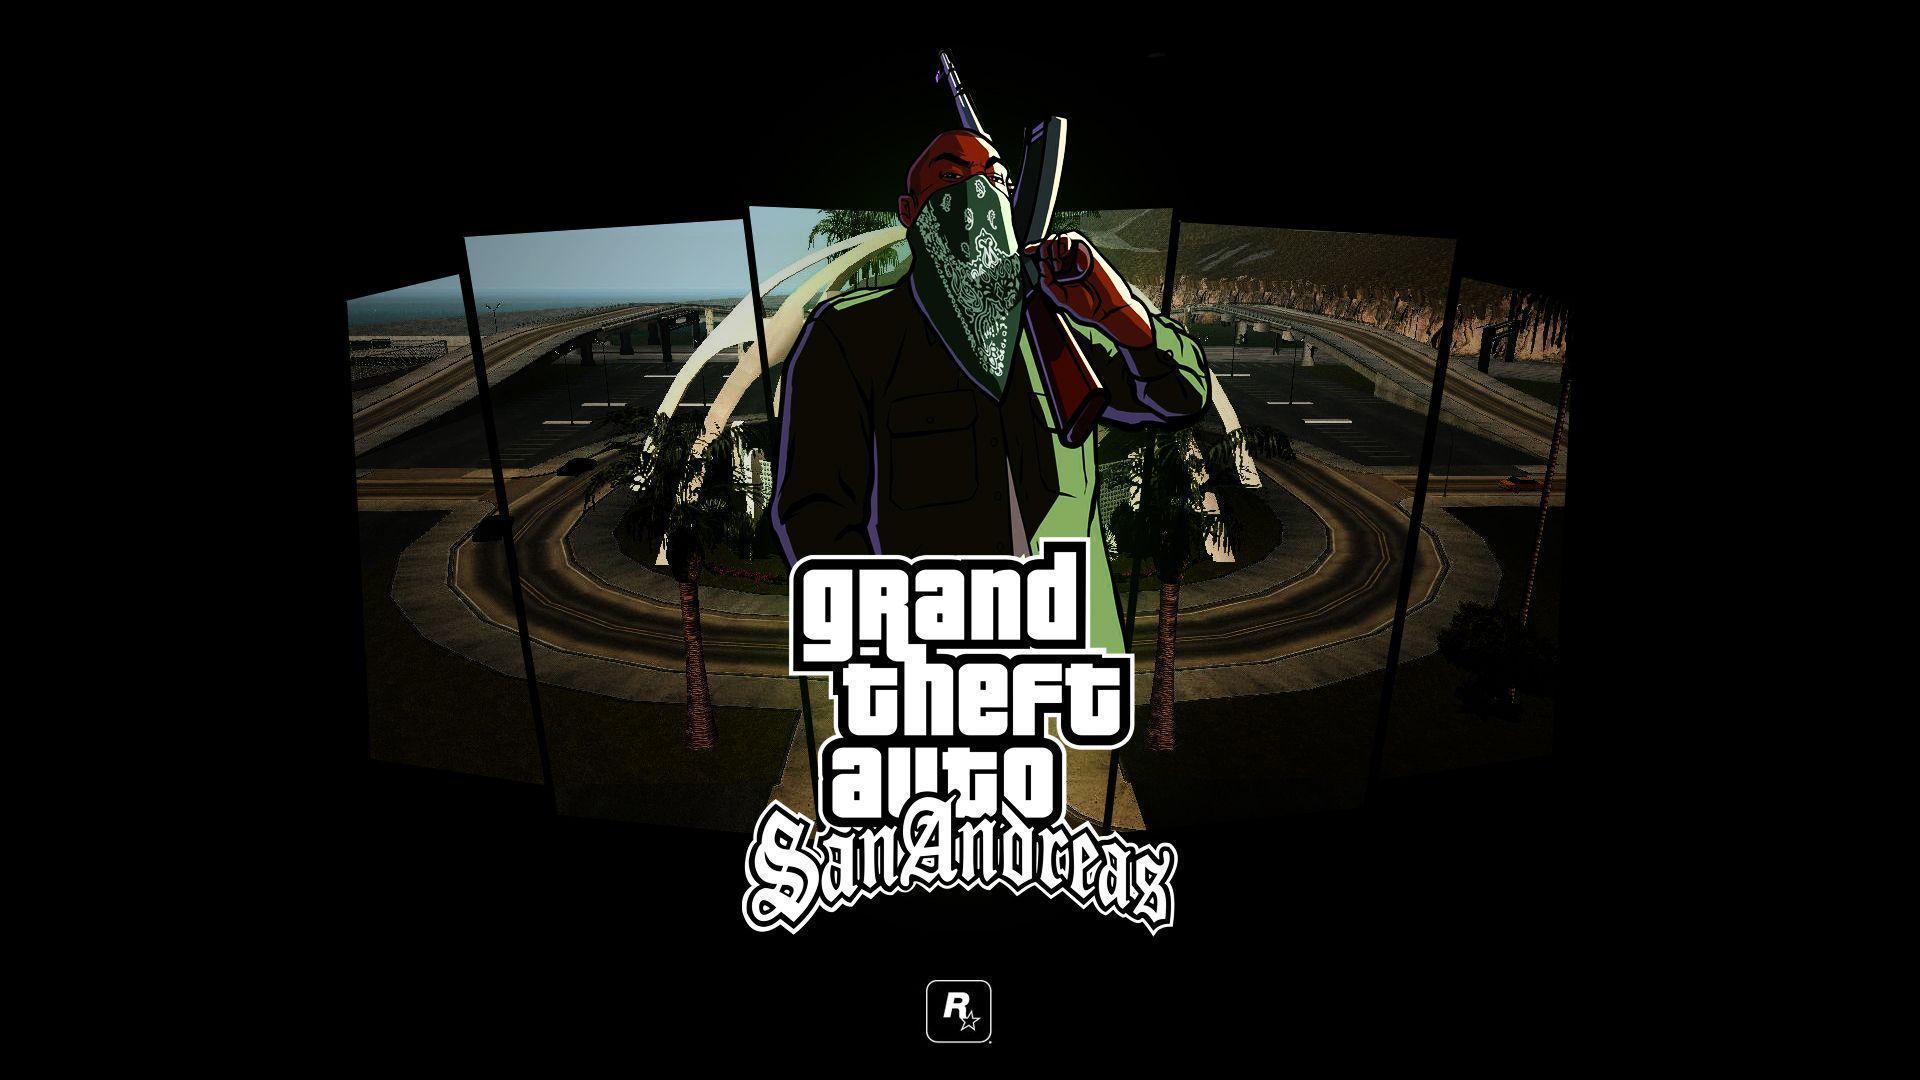 grand theft auto san